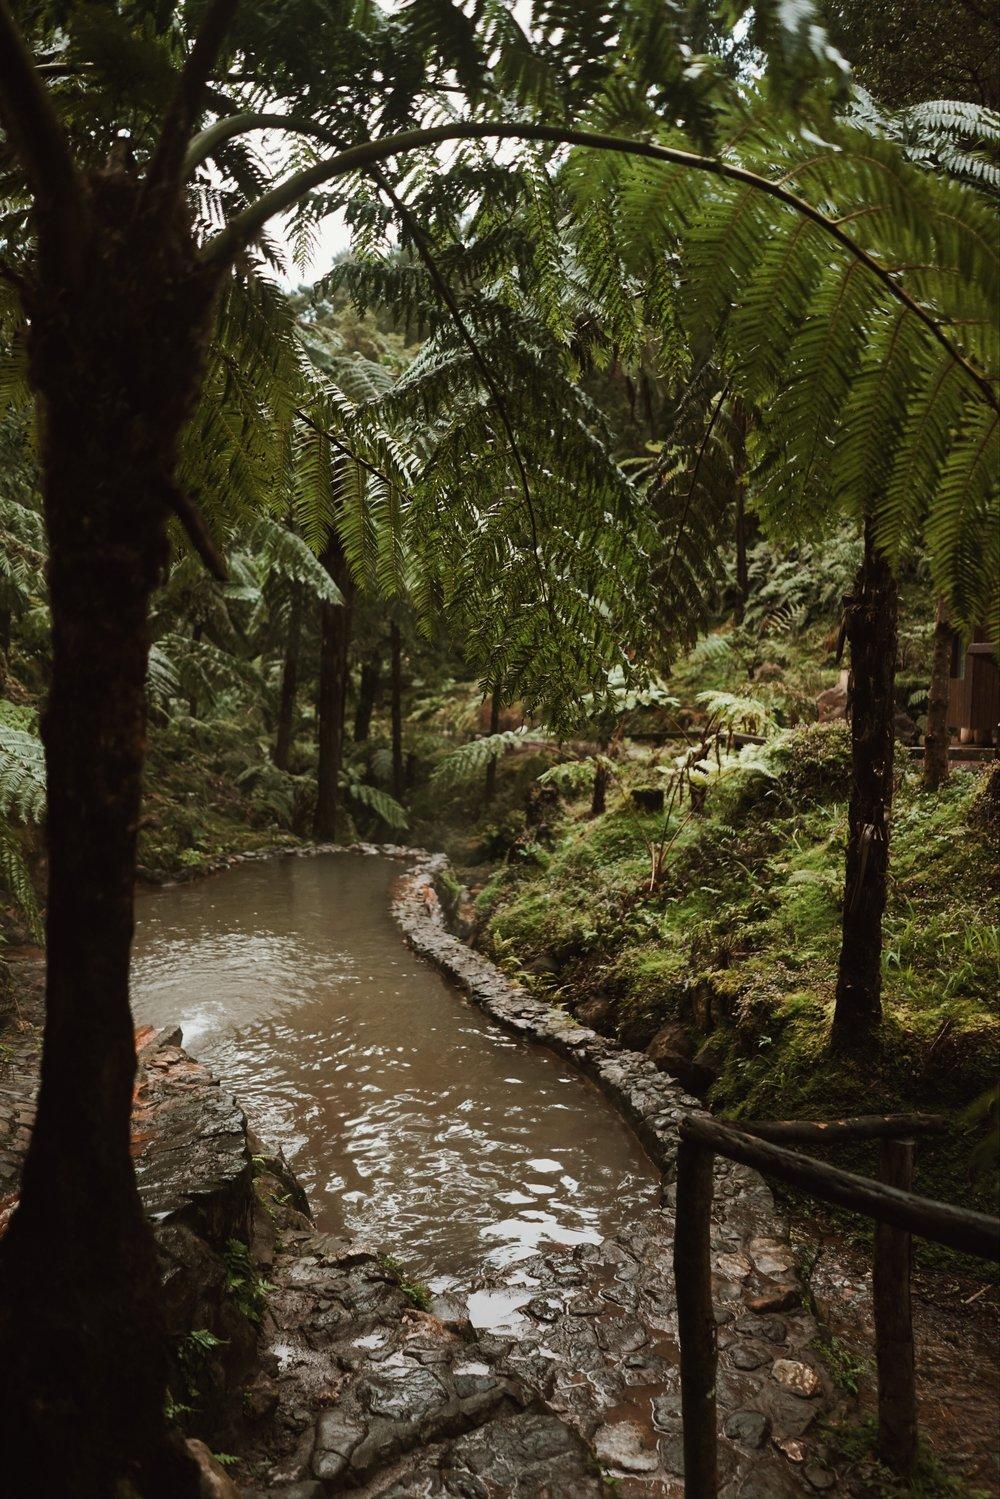 Caldeira Velha Hot Springs | What to do in the Azores | Ponta Delgada | #Travel Blog Wanderlust